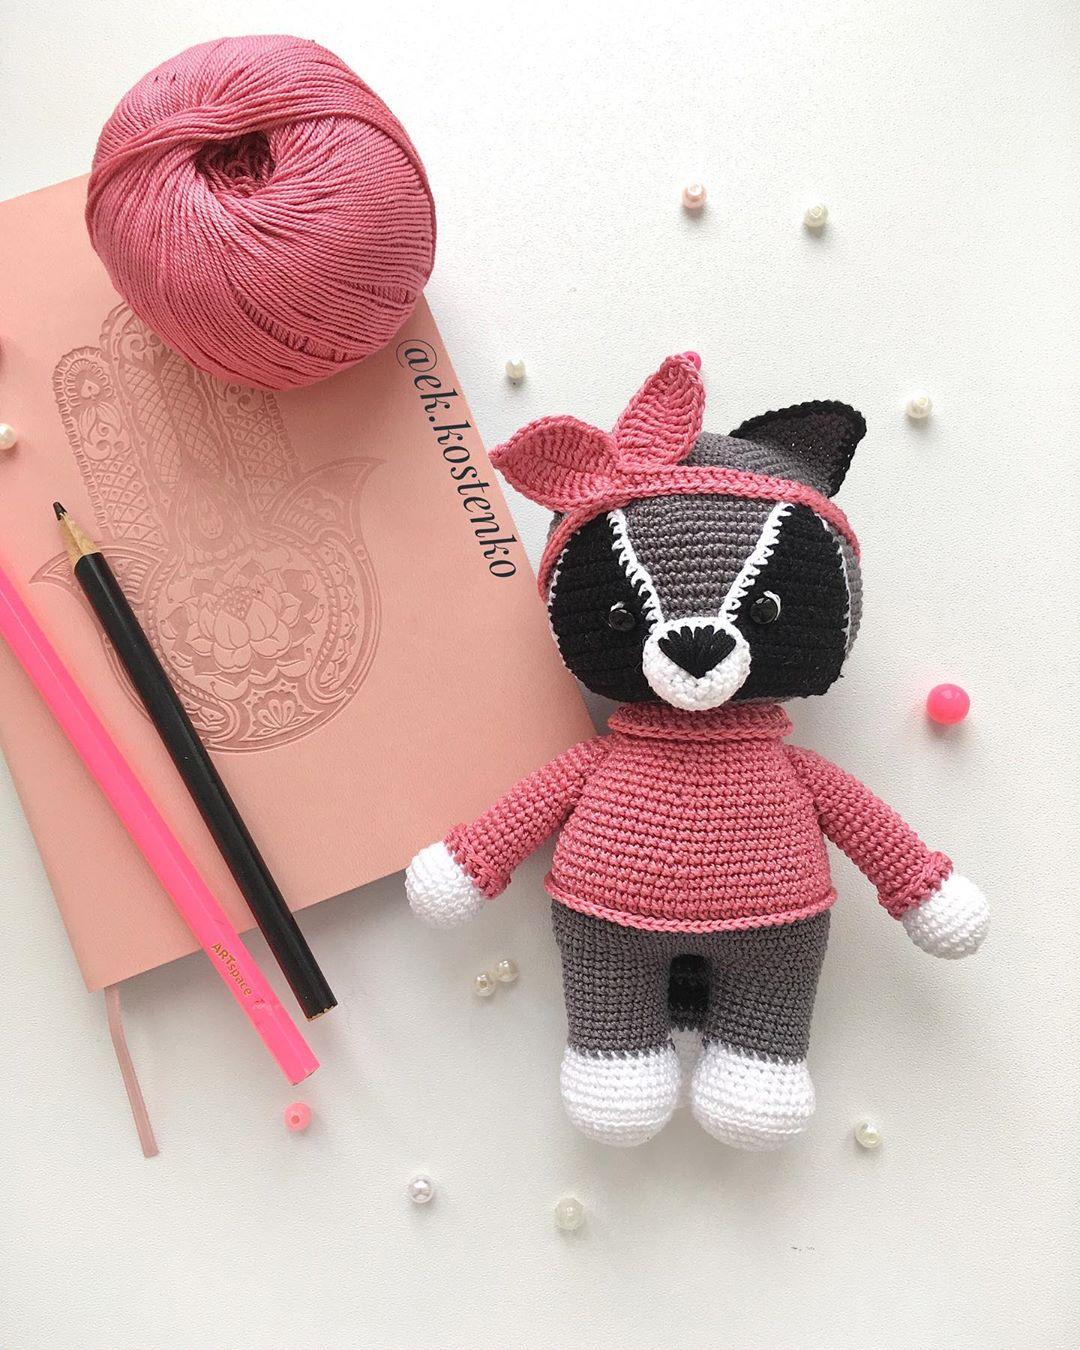 RITA THE RACCOON FREE AMIGURUMI PATTERN – CrochetIdeasFree | 1350x1080